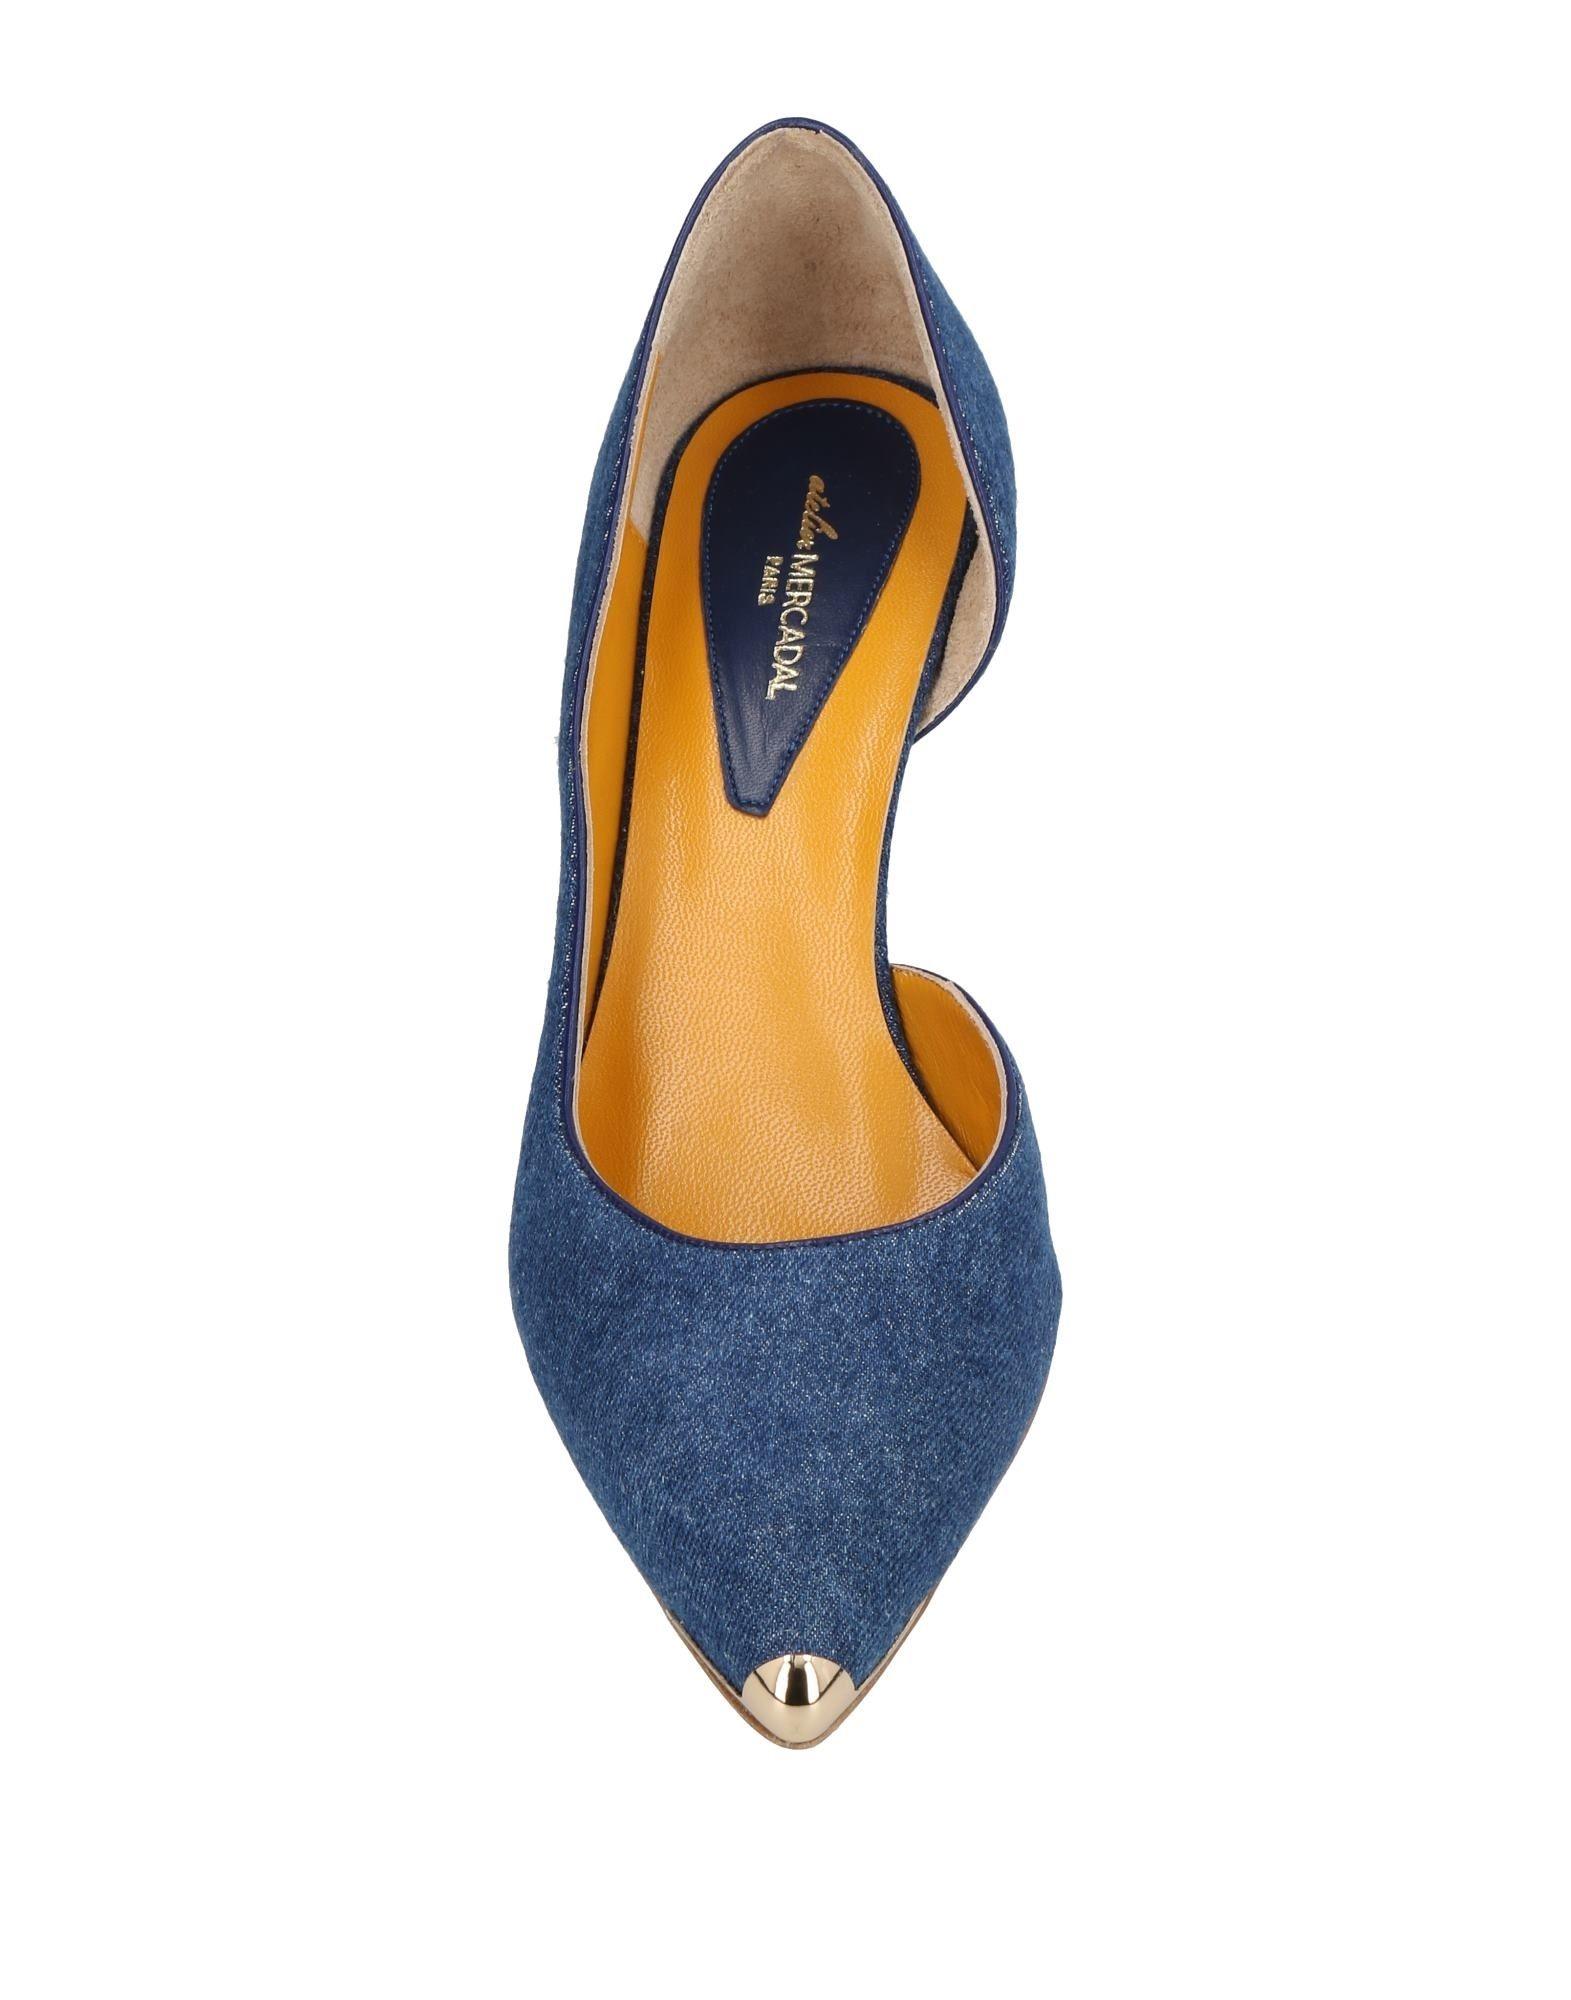 Gut um 11452852LG billige Schuhe zu tragenAtelier Mercadal Pumps Damen  11452852LG um dd004d